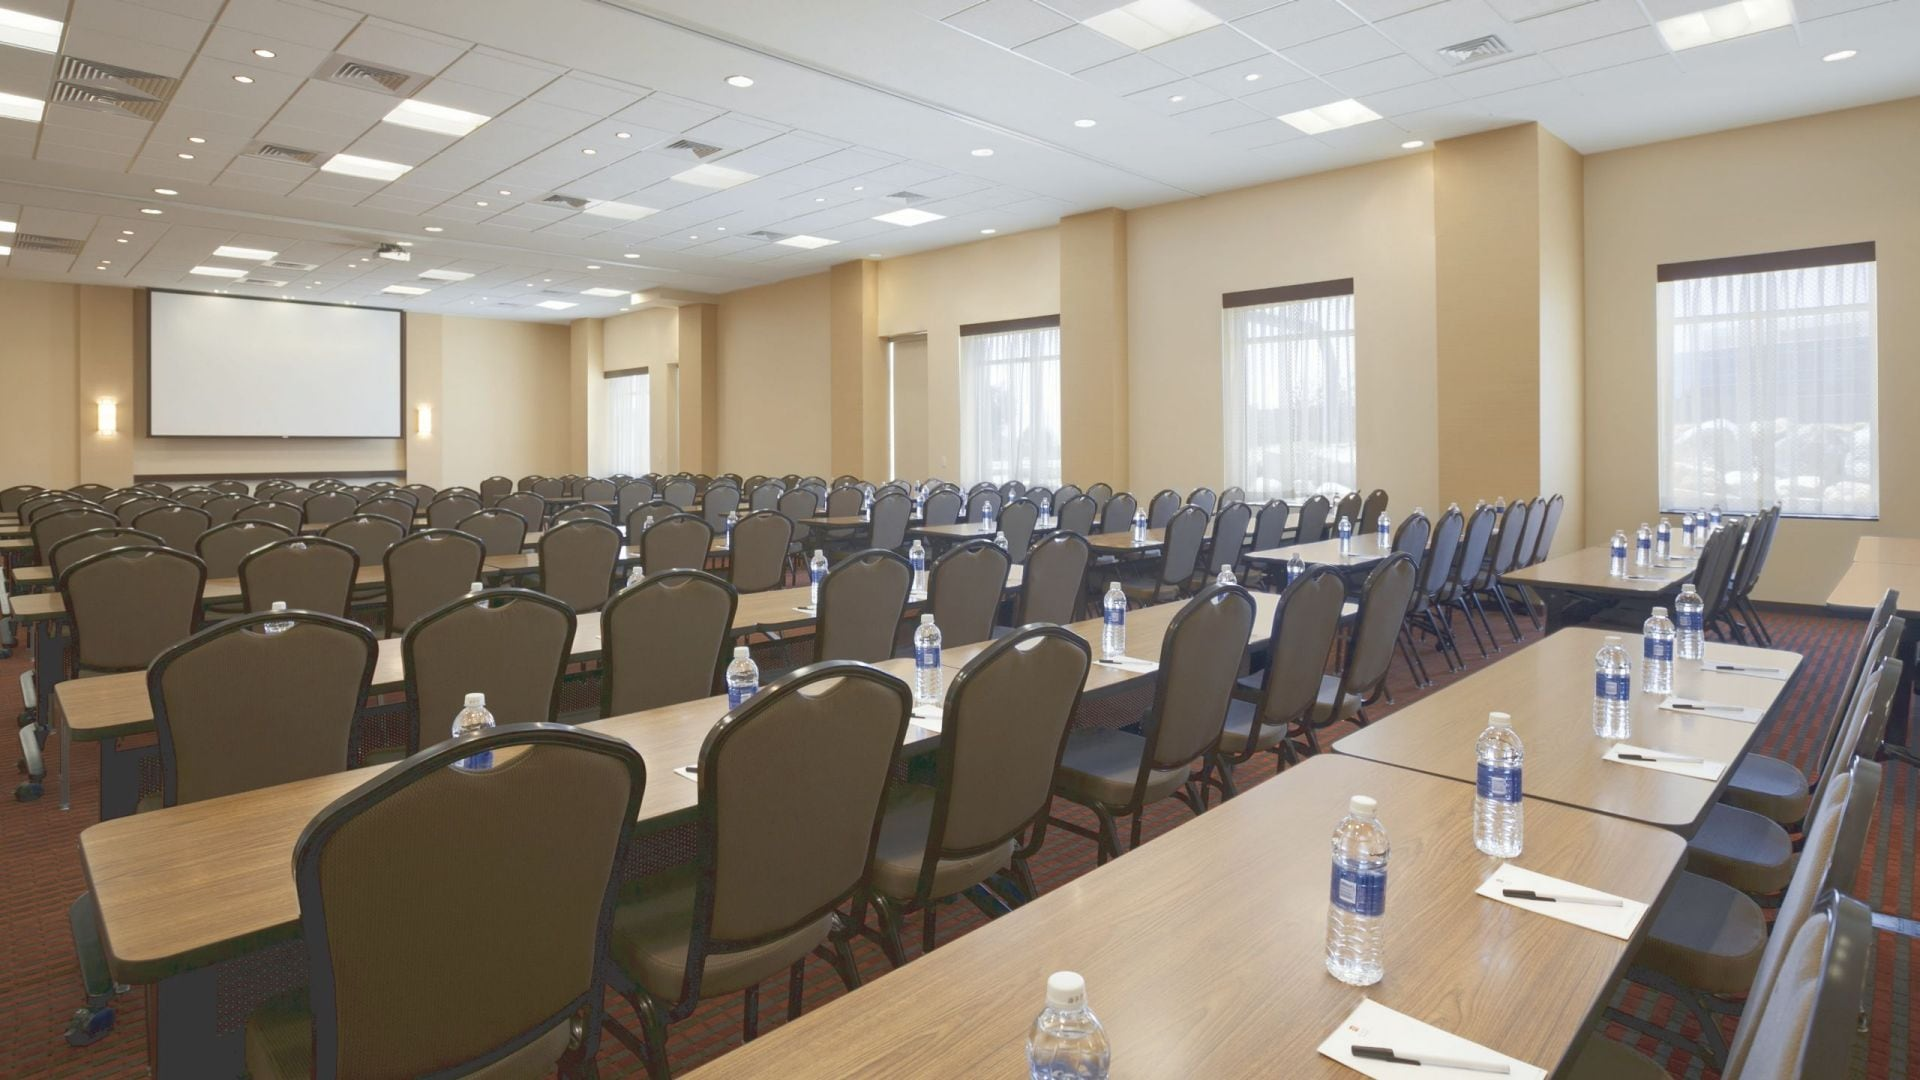 Cottonwood, UT Meeting Space Classroom Setup - Hyatt Place Salt Lake City/Cottonwood